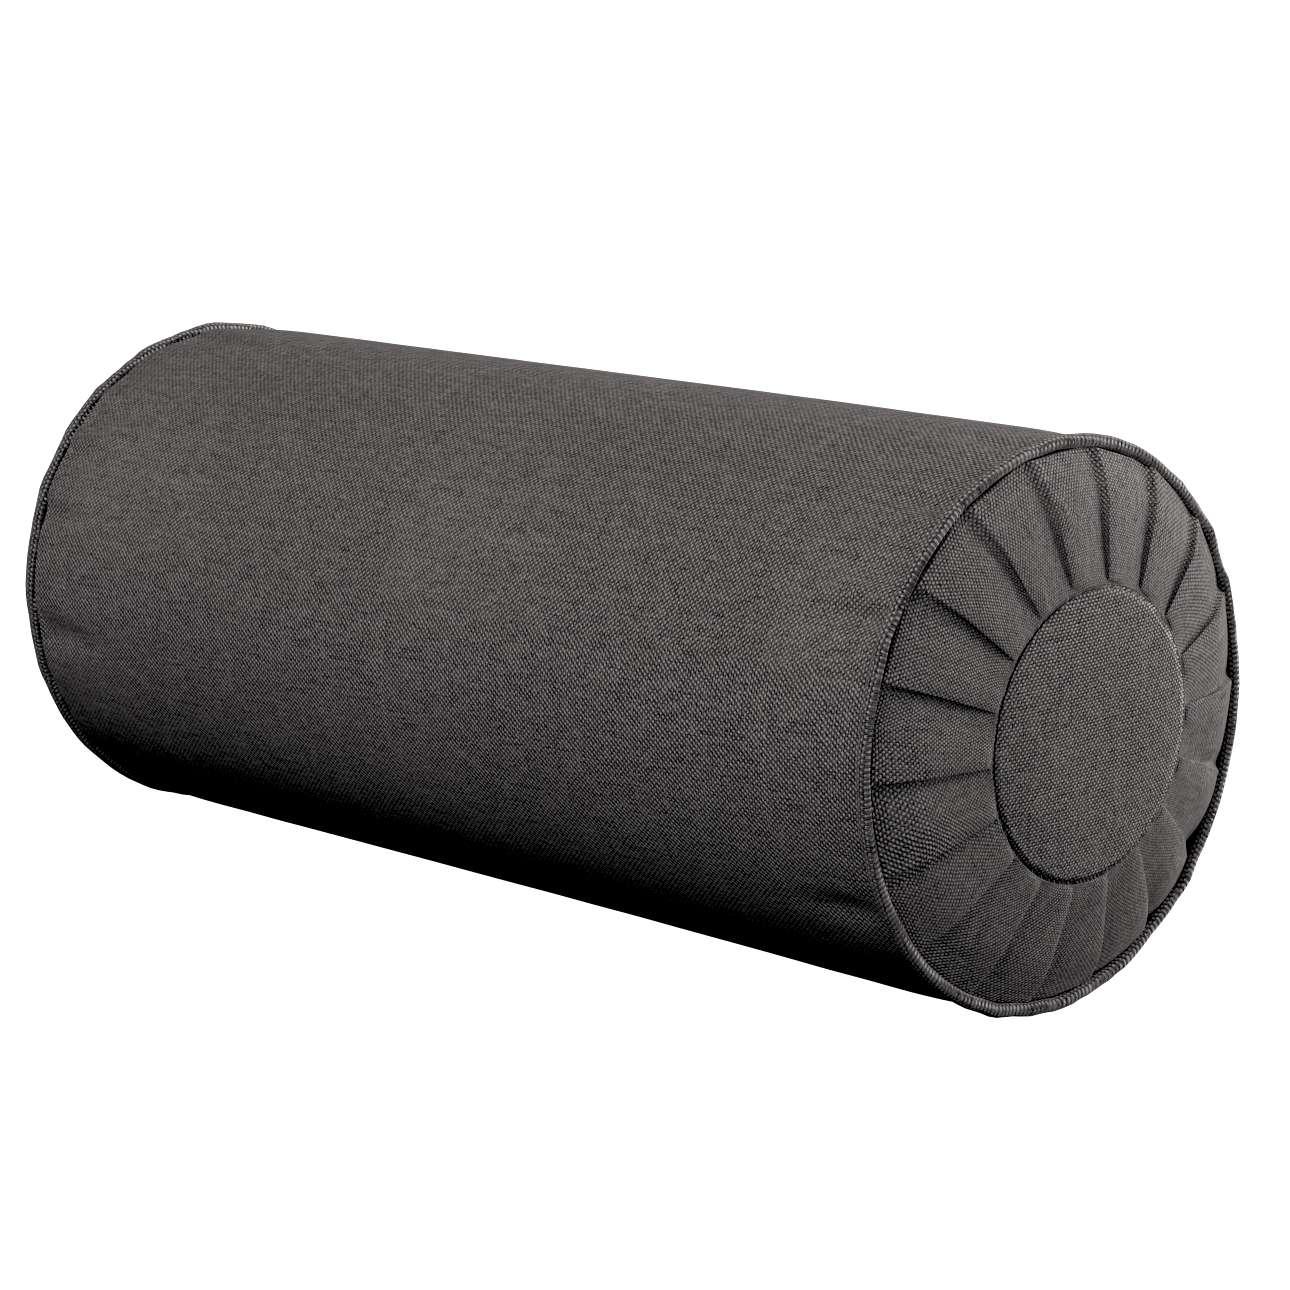 Nackkudde - pliserad kant i kollektionen Etna, Tyg: 705-35